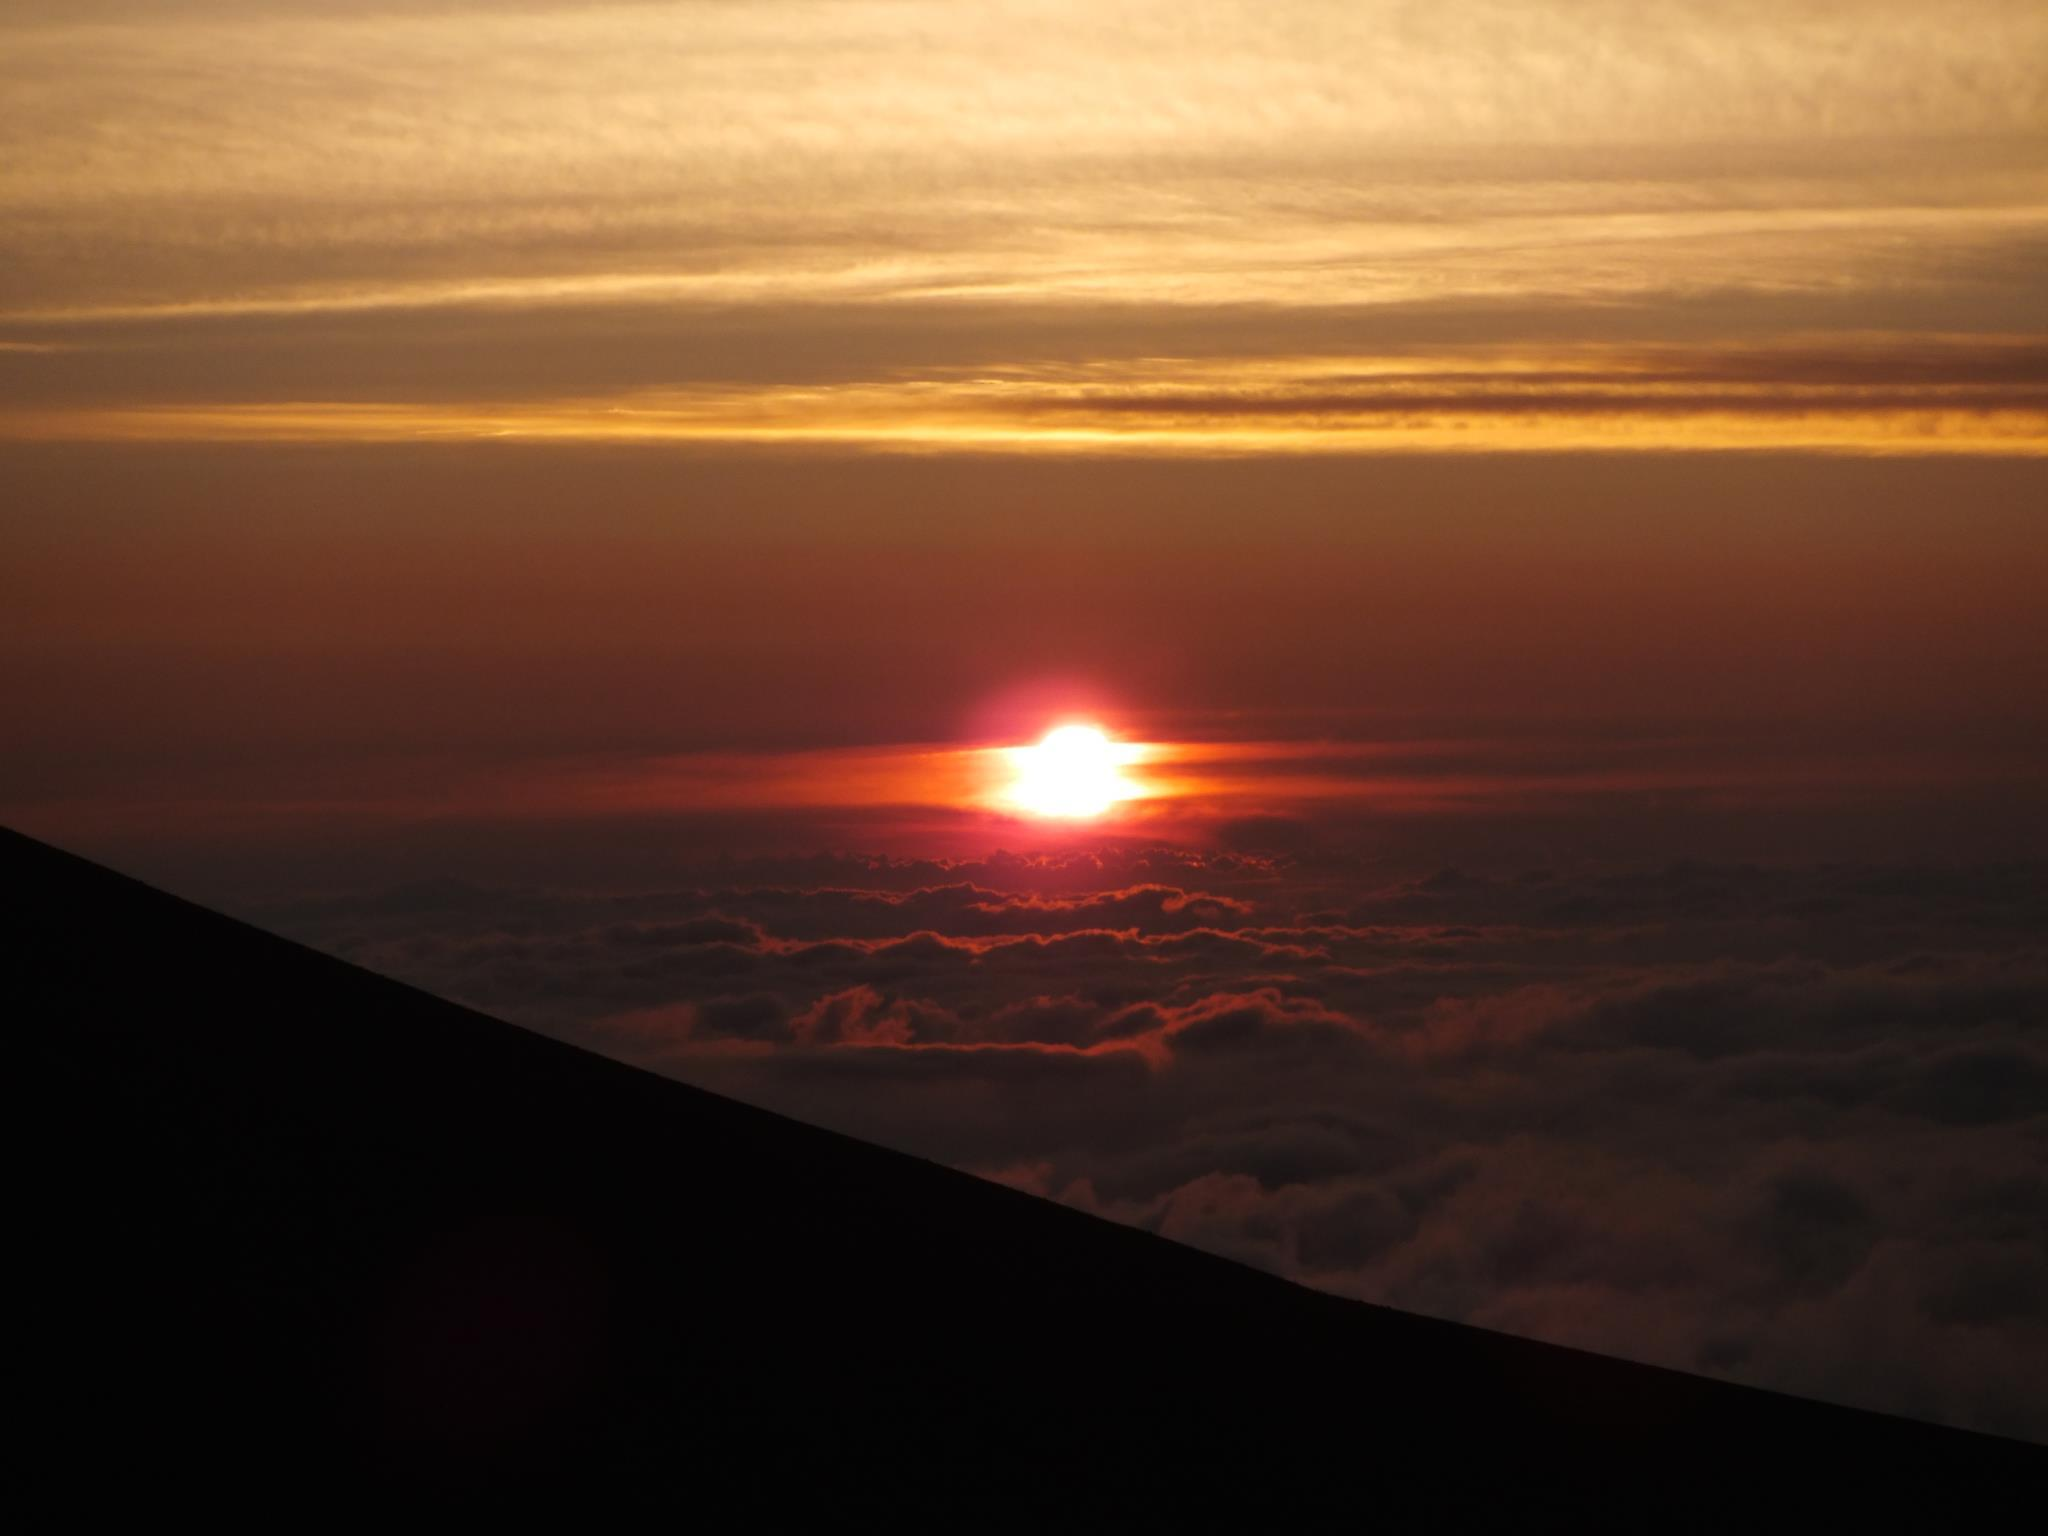 Goraikou Sanso   Lodge At 7th Point Of Mt. Fuji